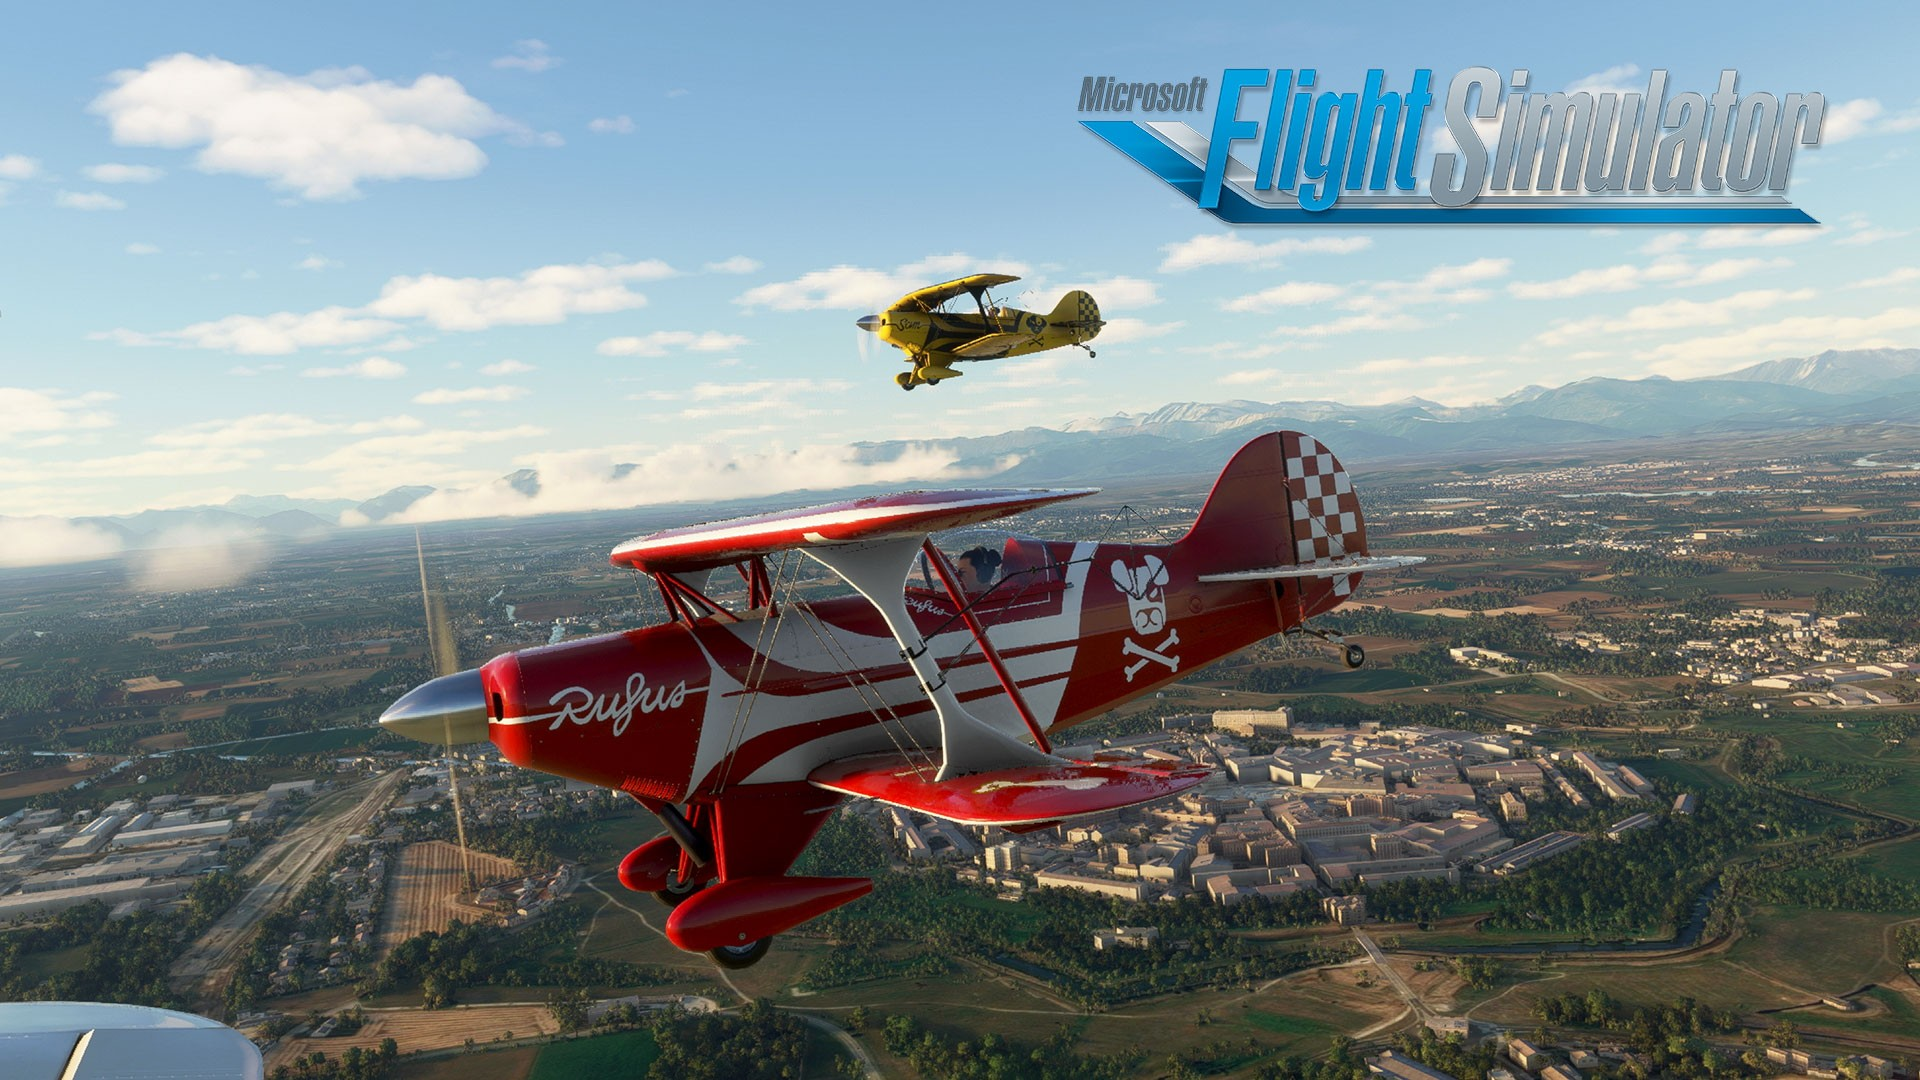 Microsoft Fllight Simulator